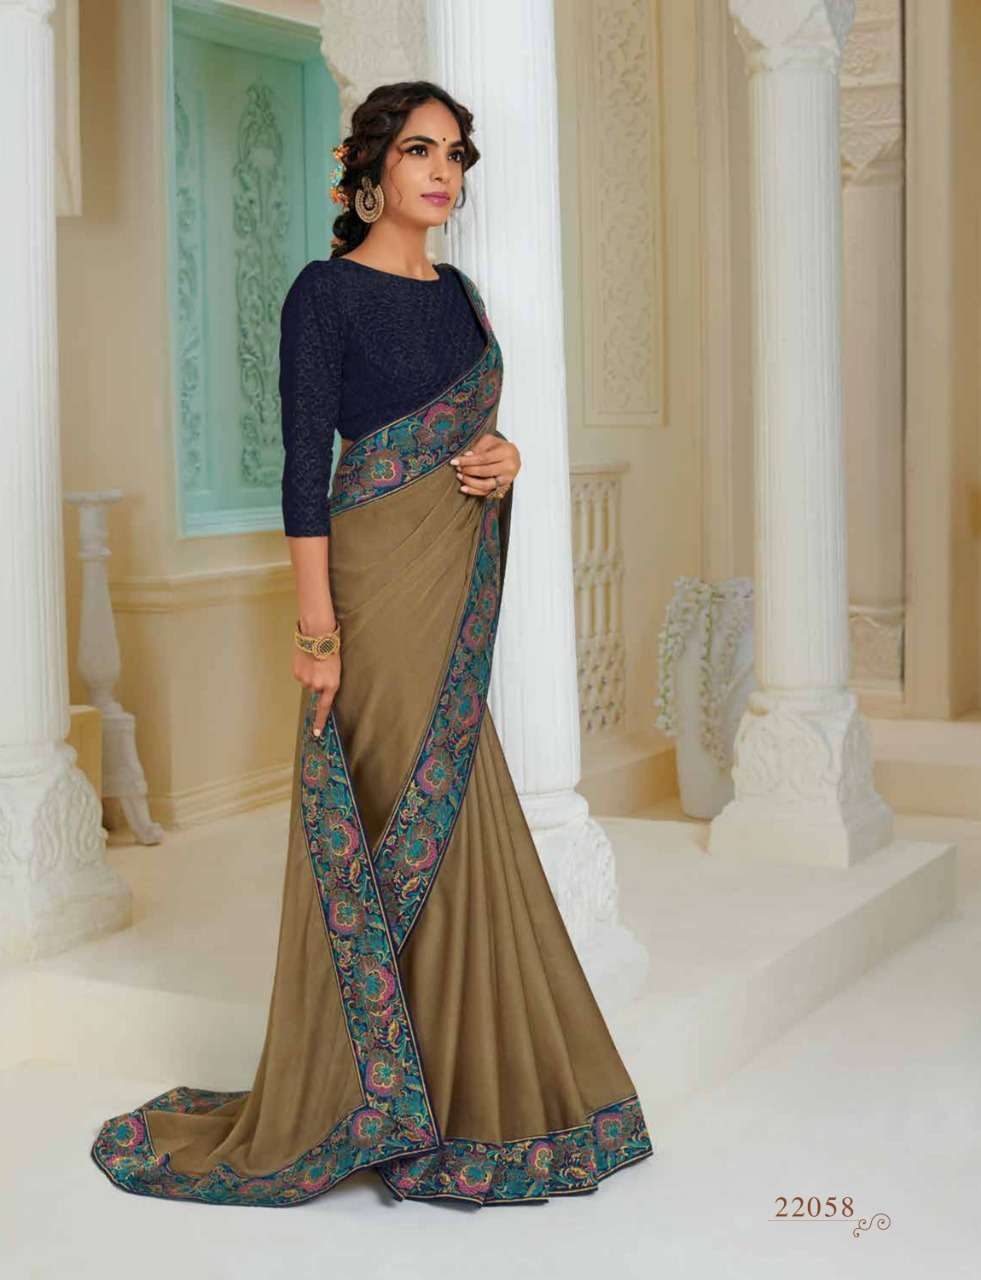 Subhash Manjri Fancy Designer Party Wear Sarees Collection 08